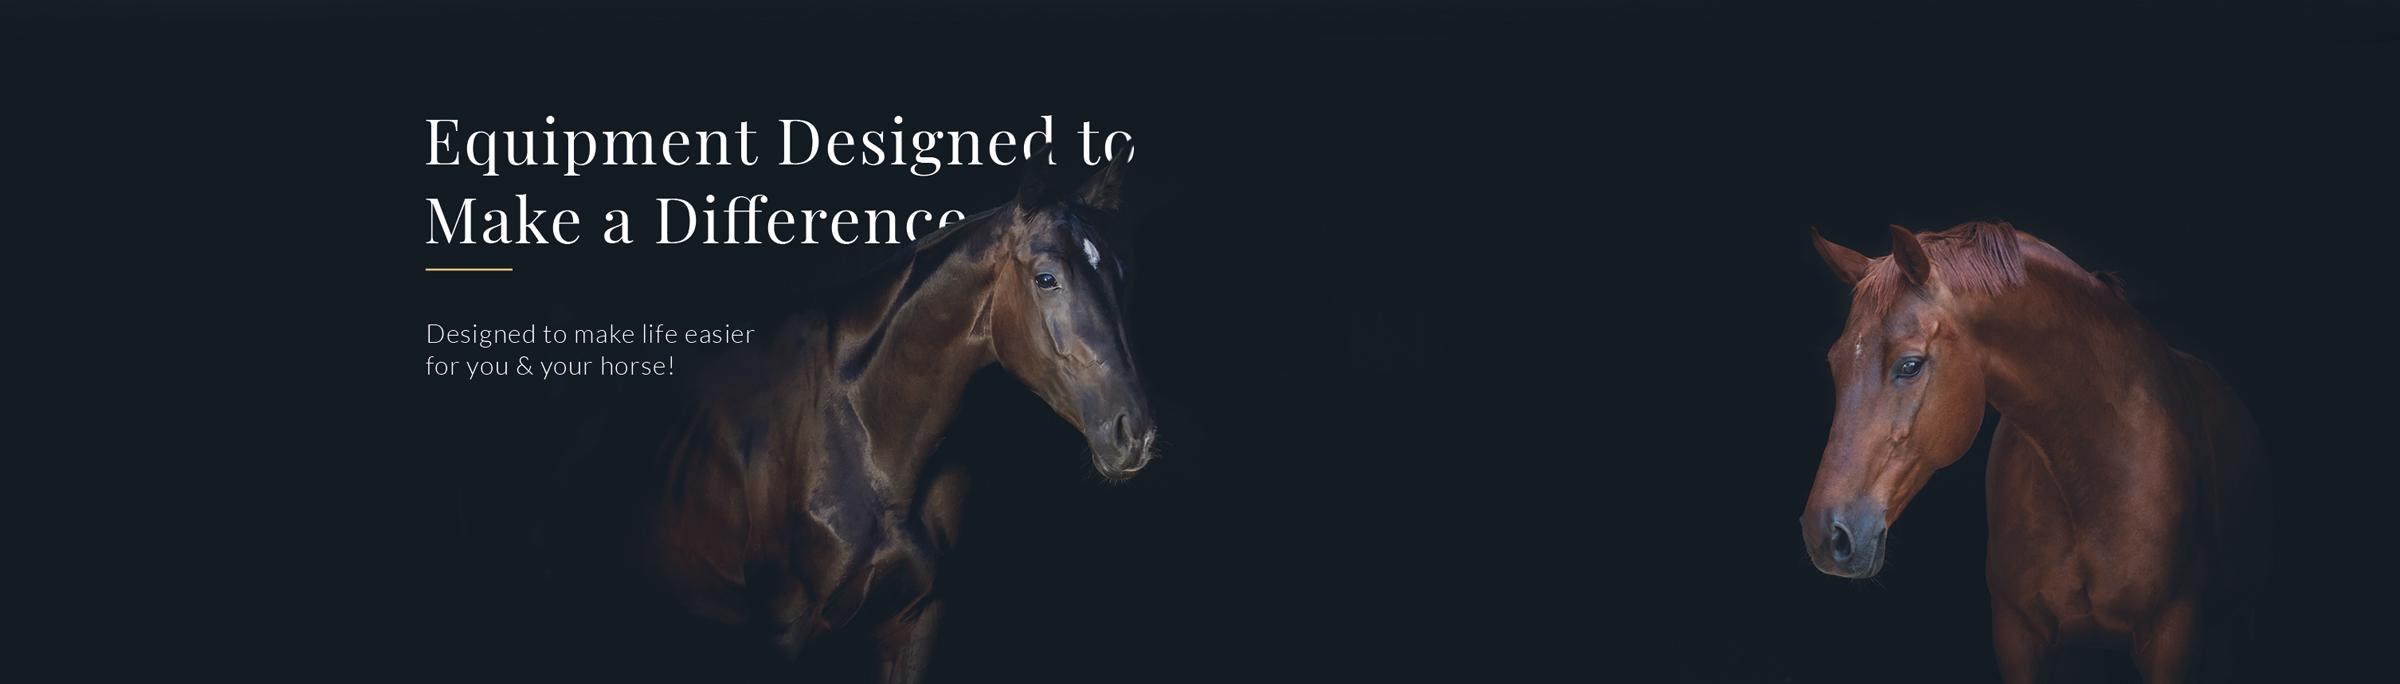 Horse equipment banner